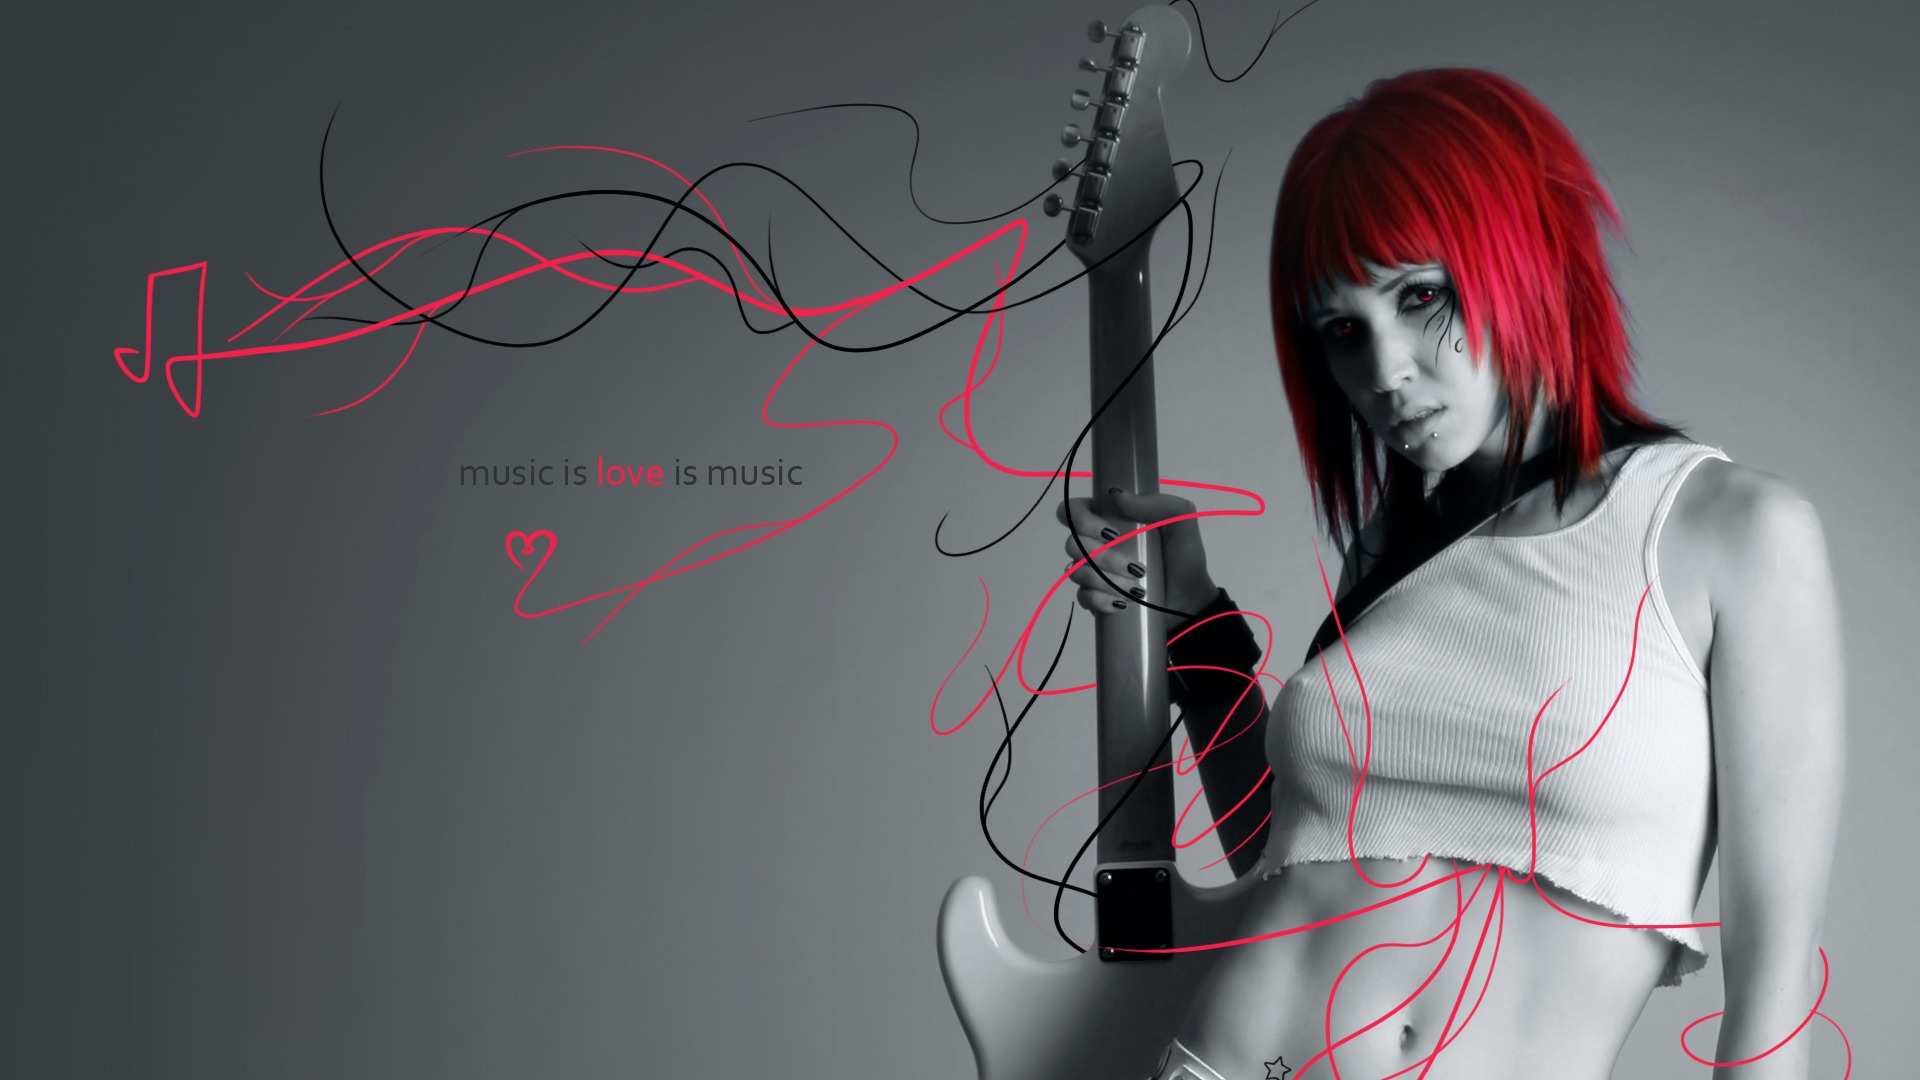 Must see Wallpaper Love Guitar - music_is_love_wallpaper_female_singers_music_985  Graphic_273970.jpg